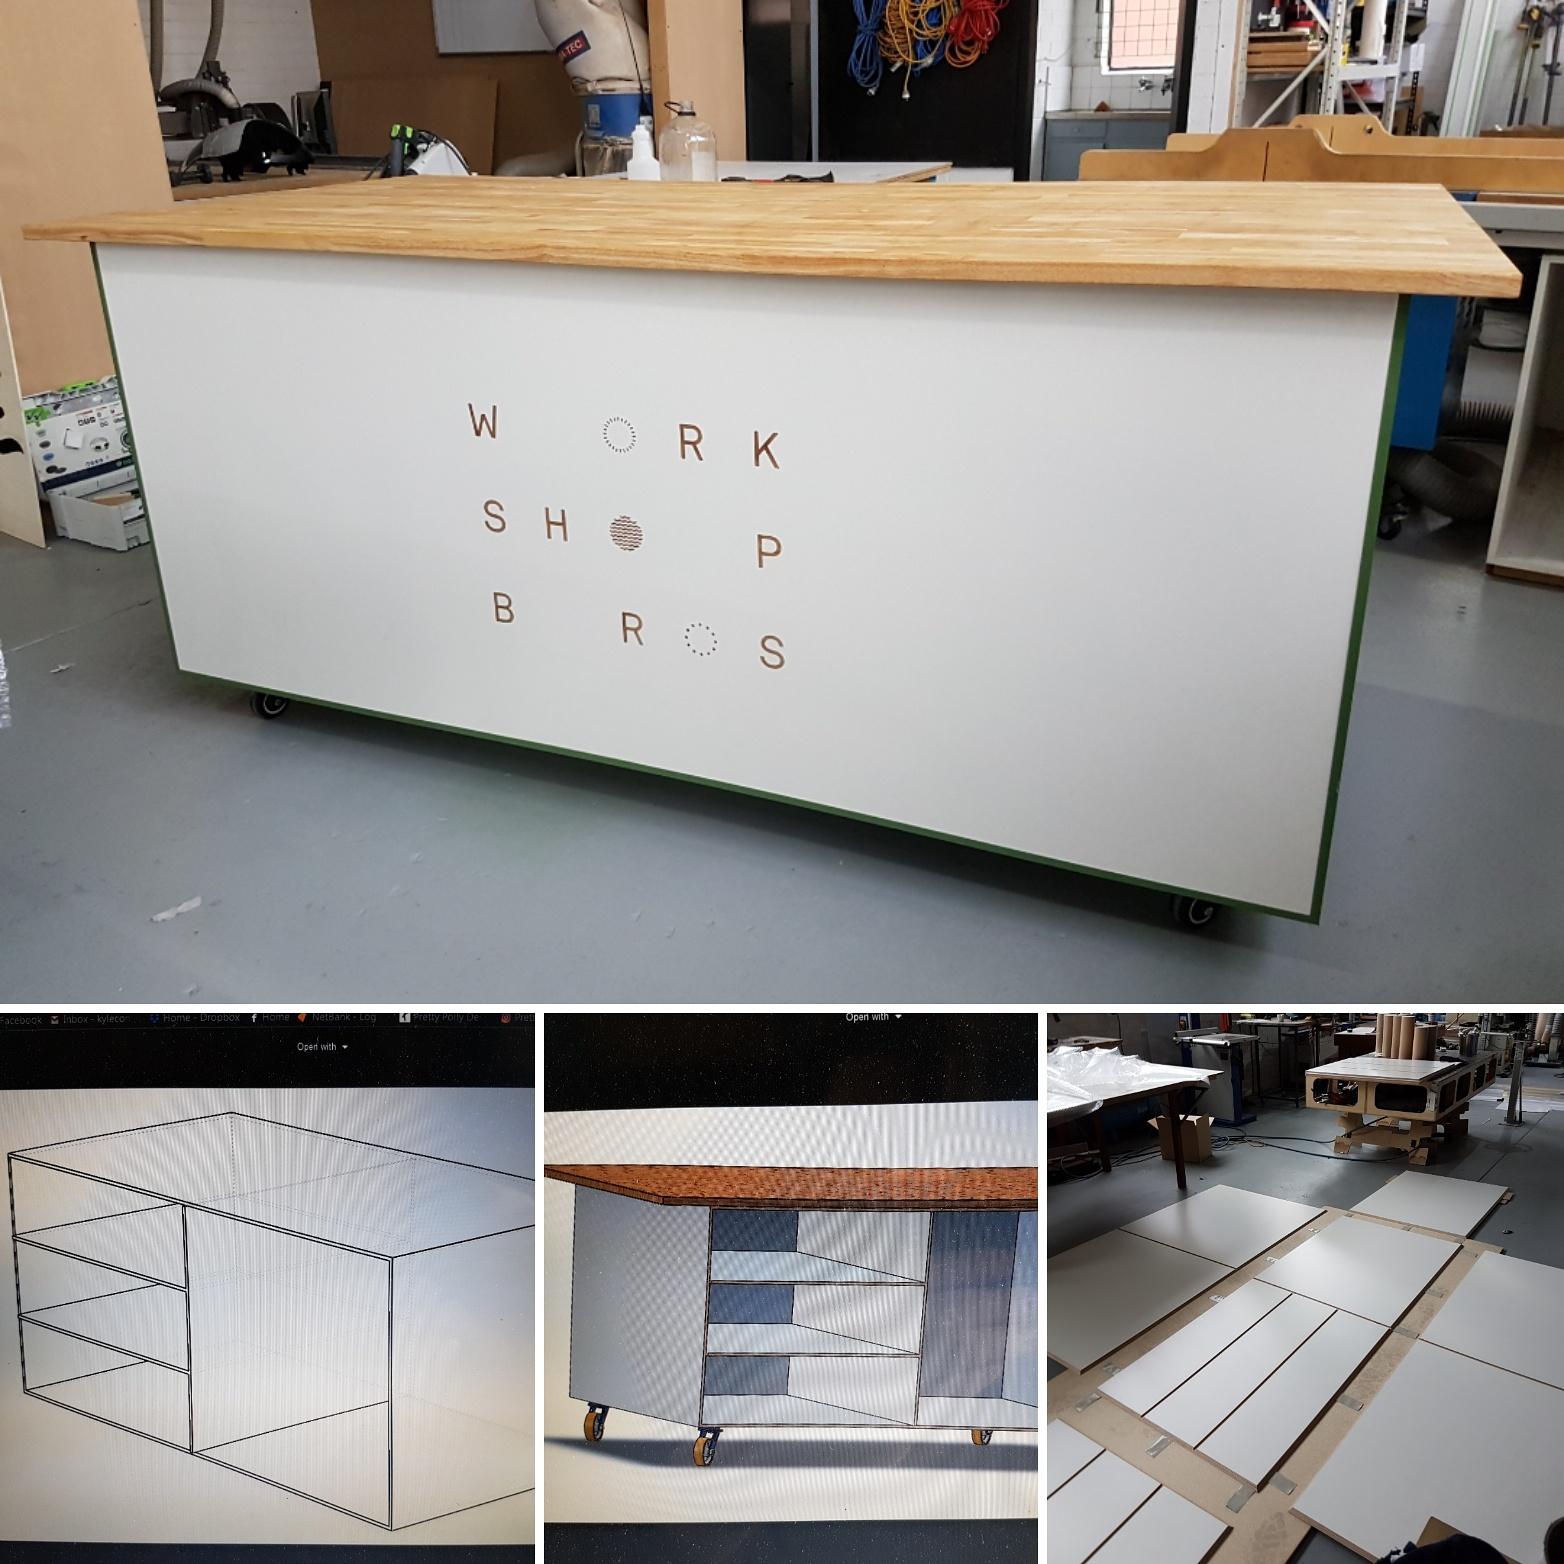 Workshop Bro's coffee cart.